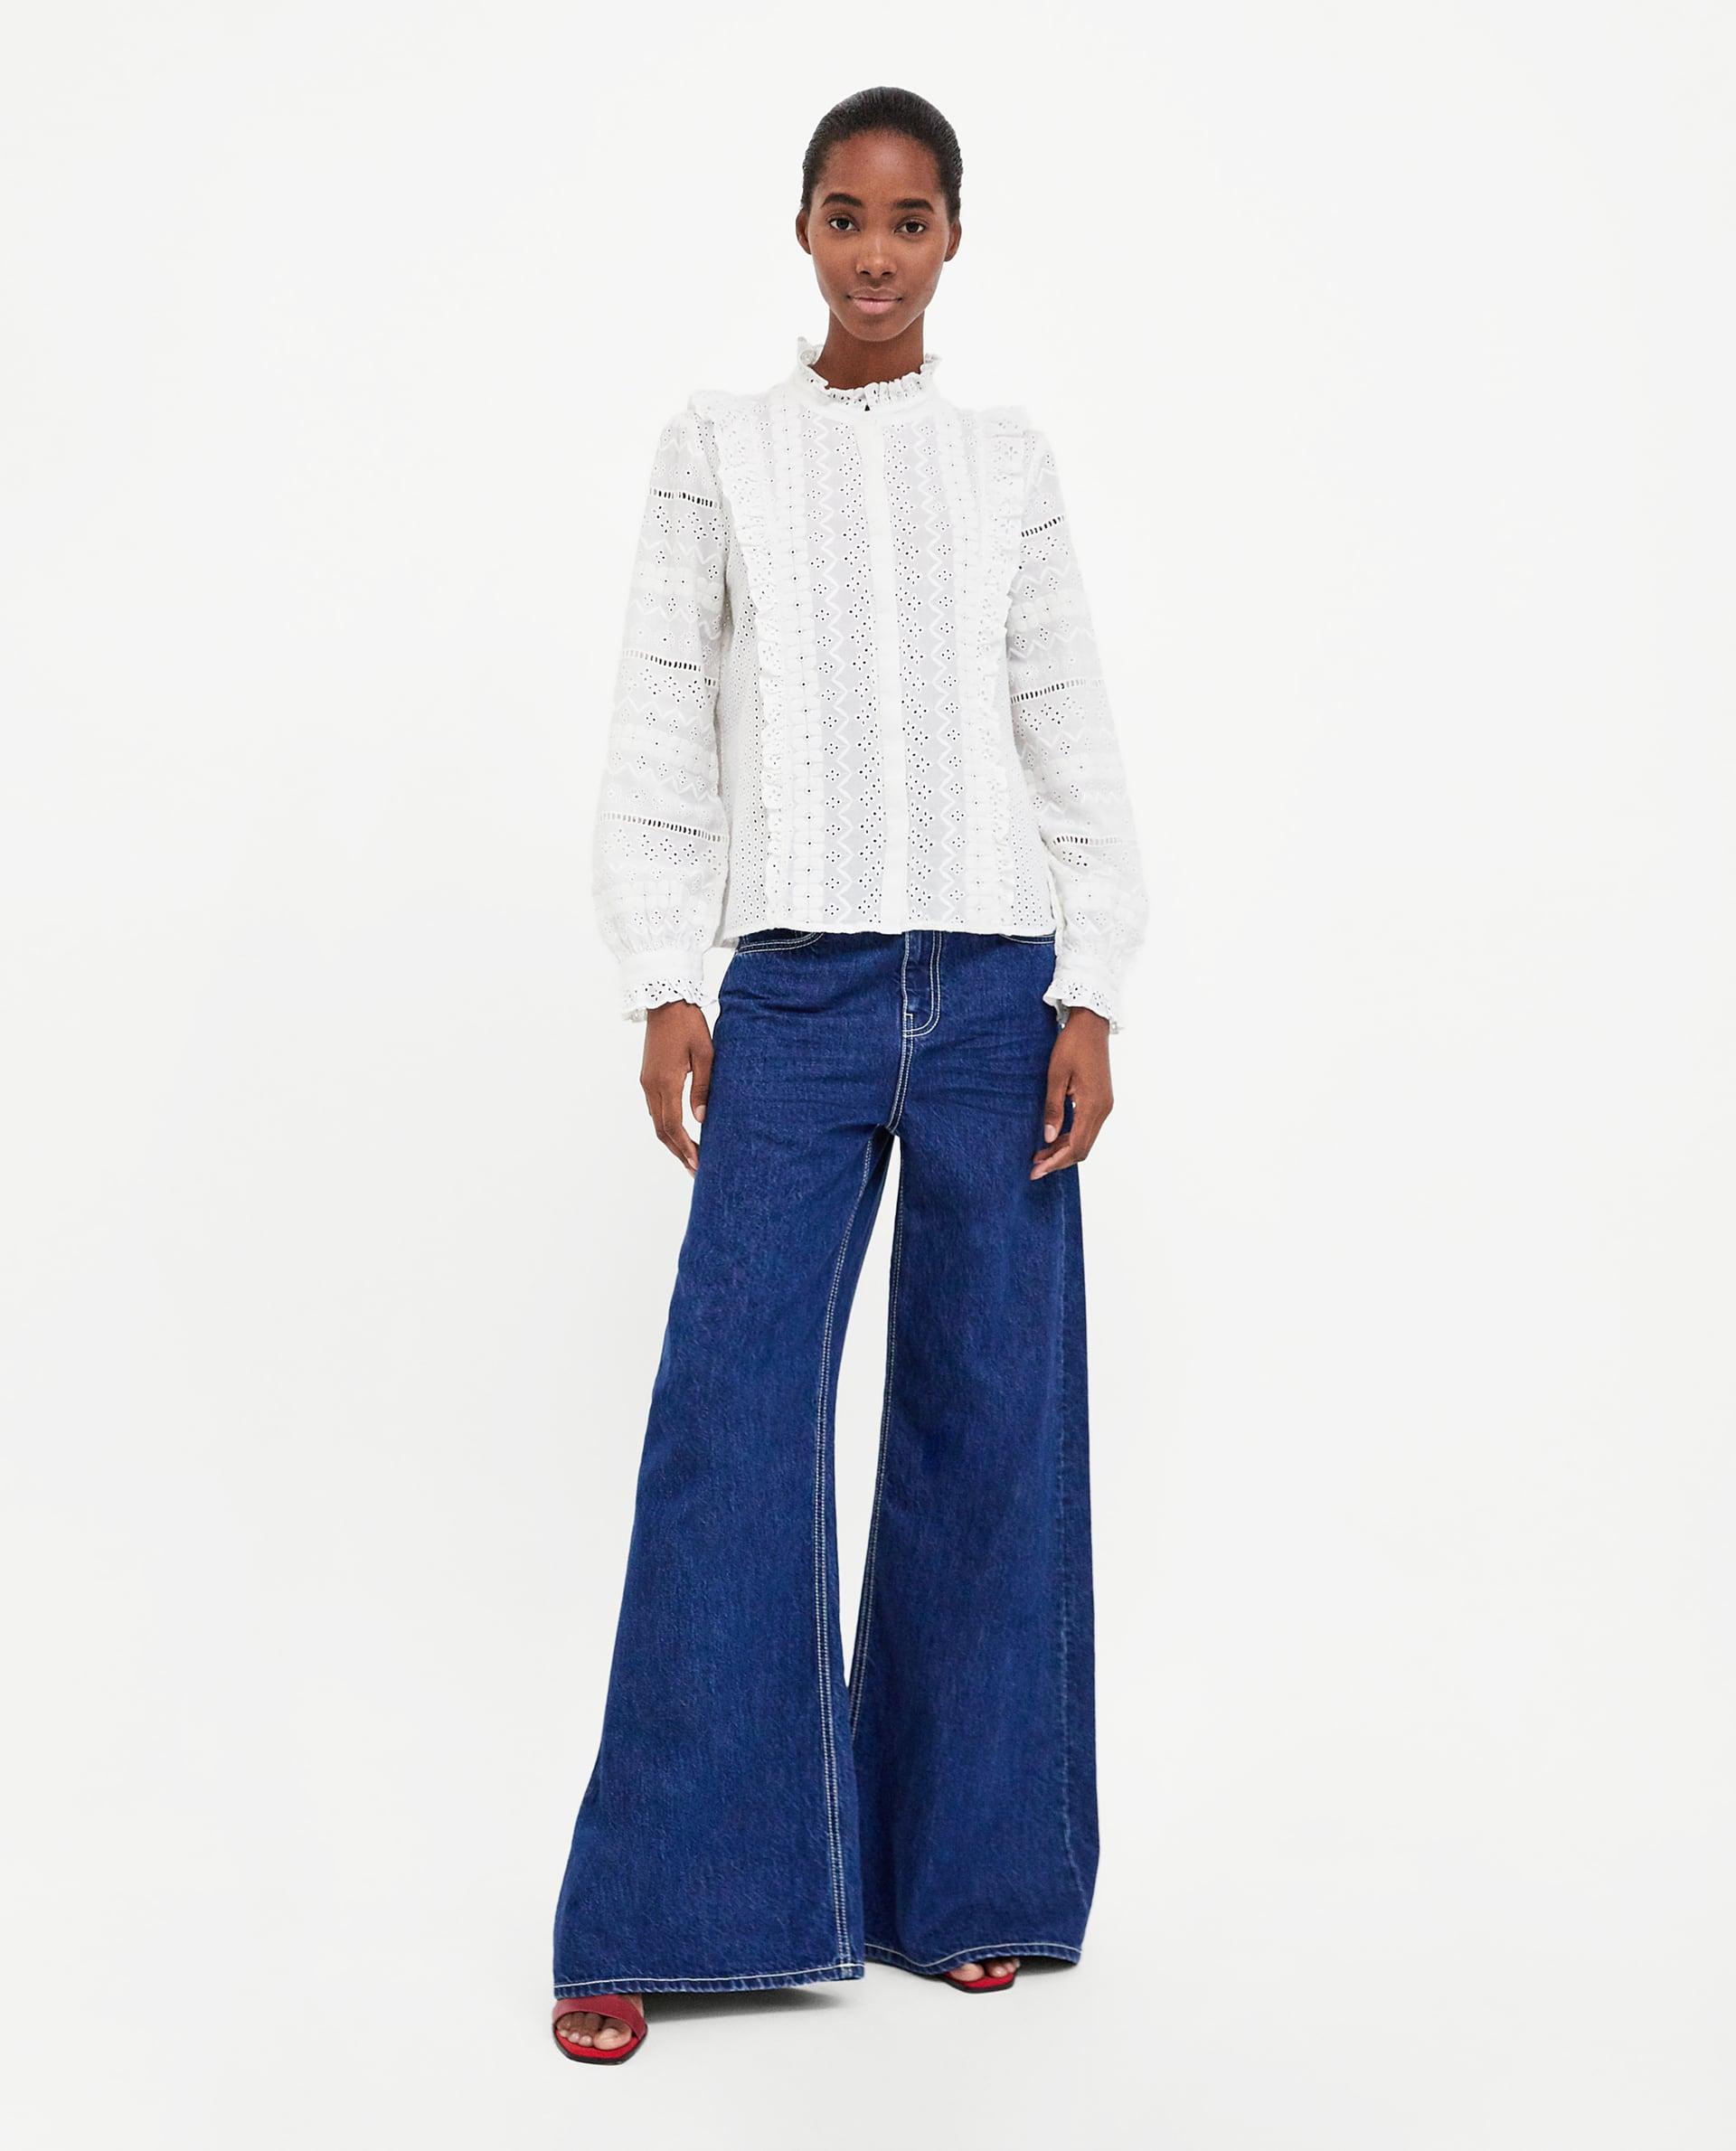 zara look boho jeans